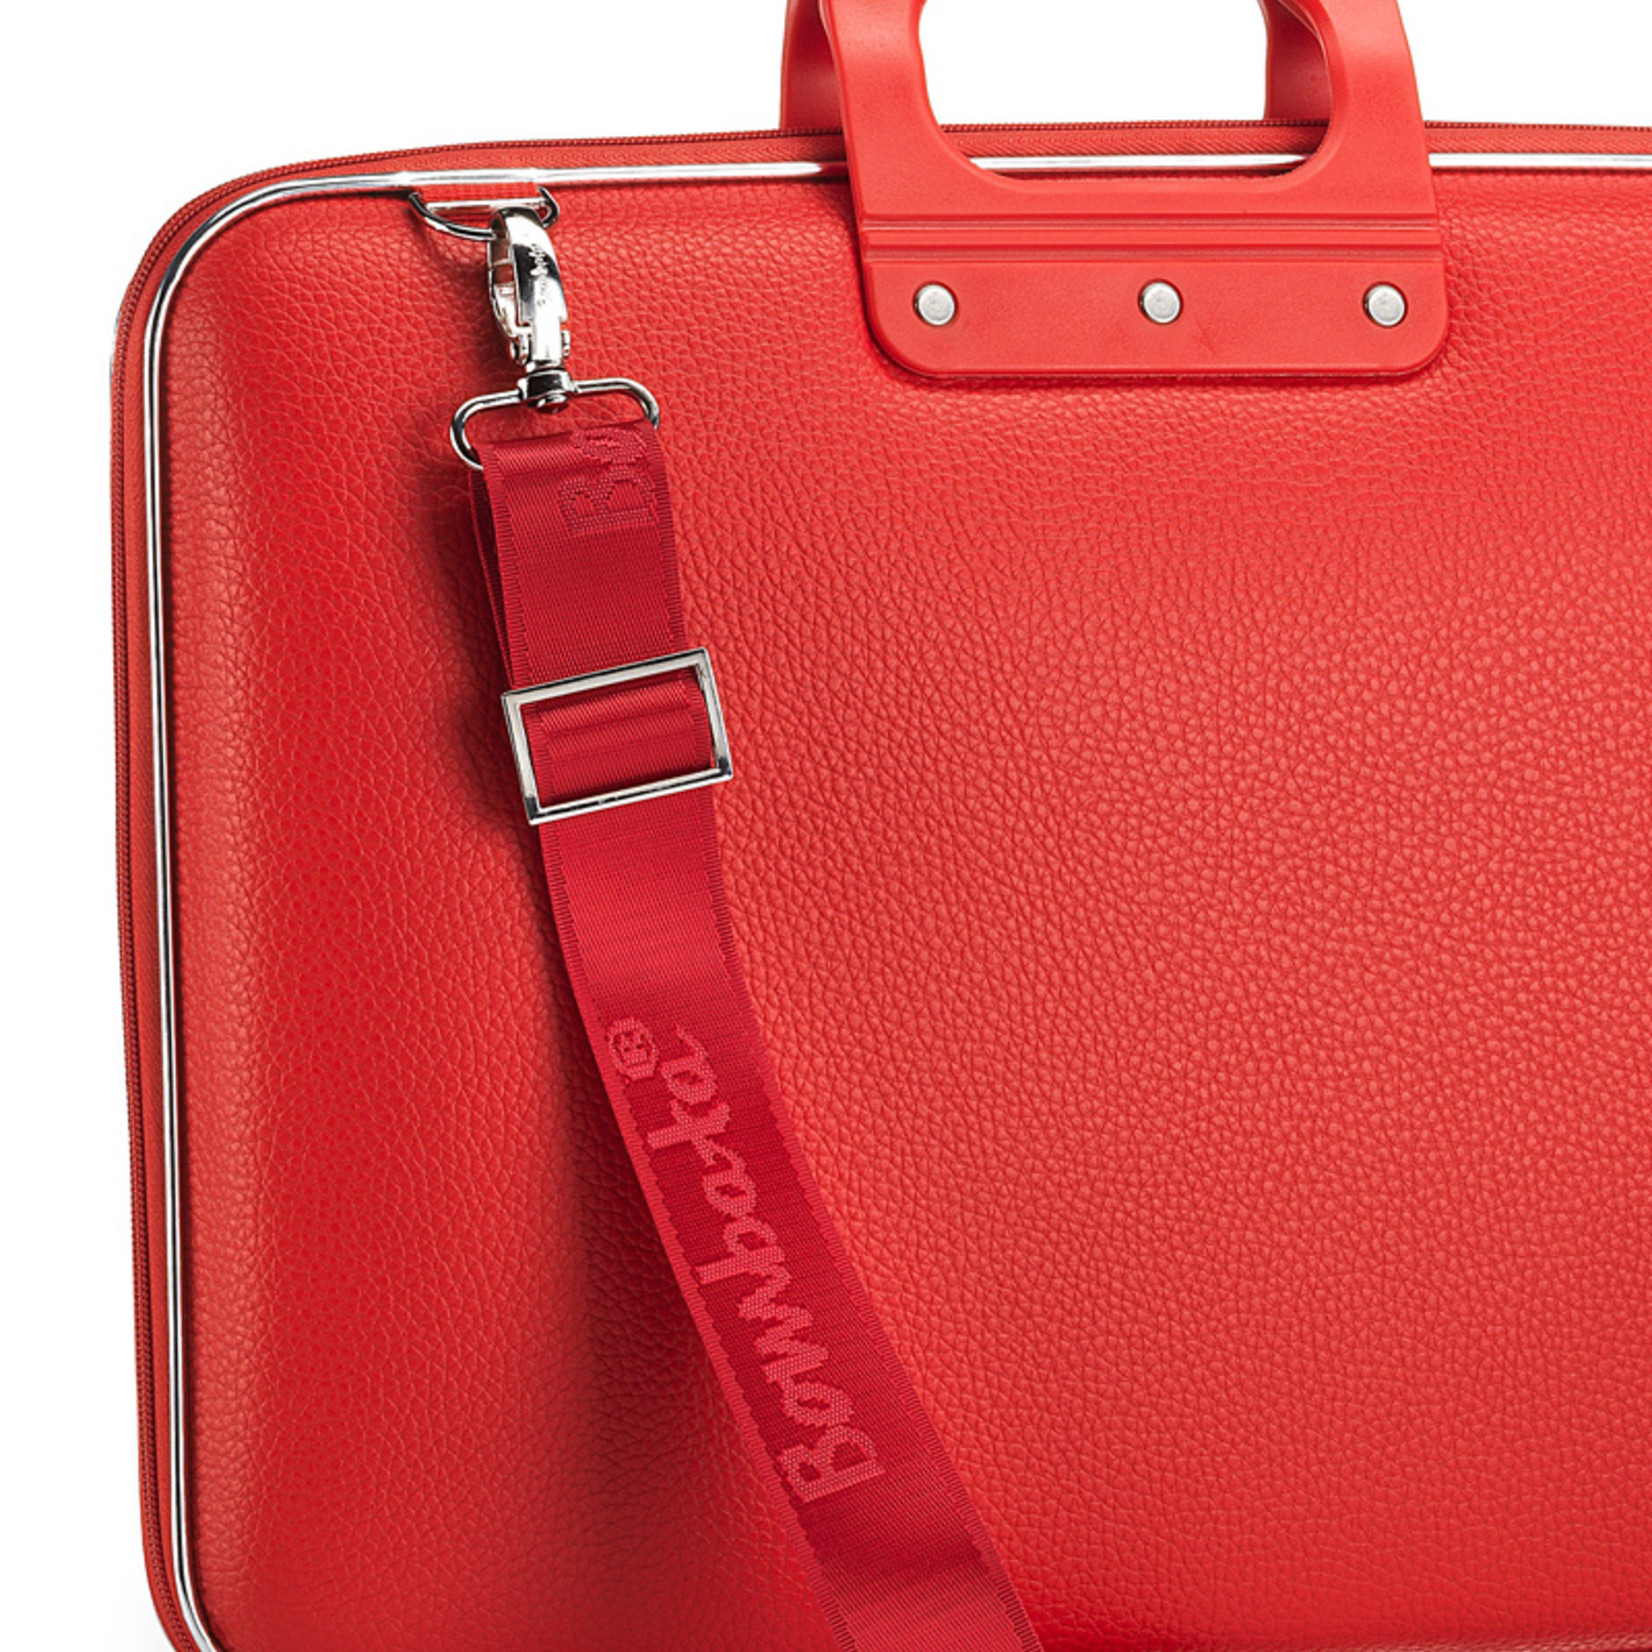 "Bombata Taschen Laptoptasche 15,6"" | Bombata Classic | Notebooktasche türkis"